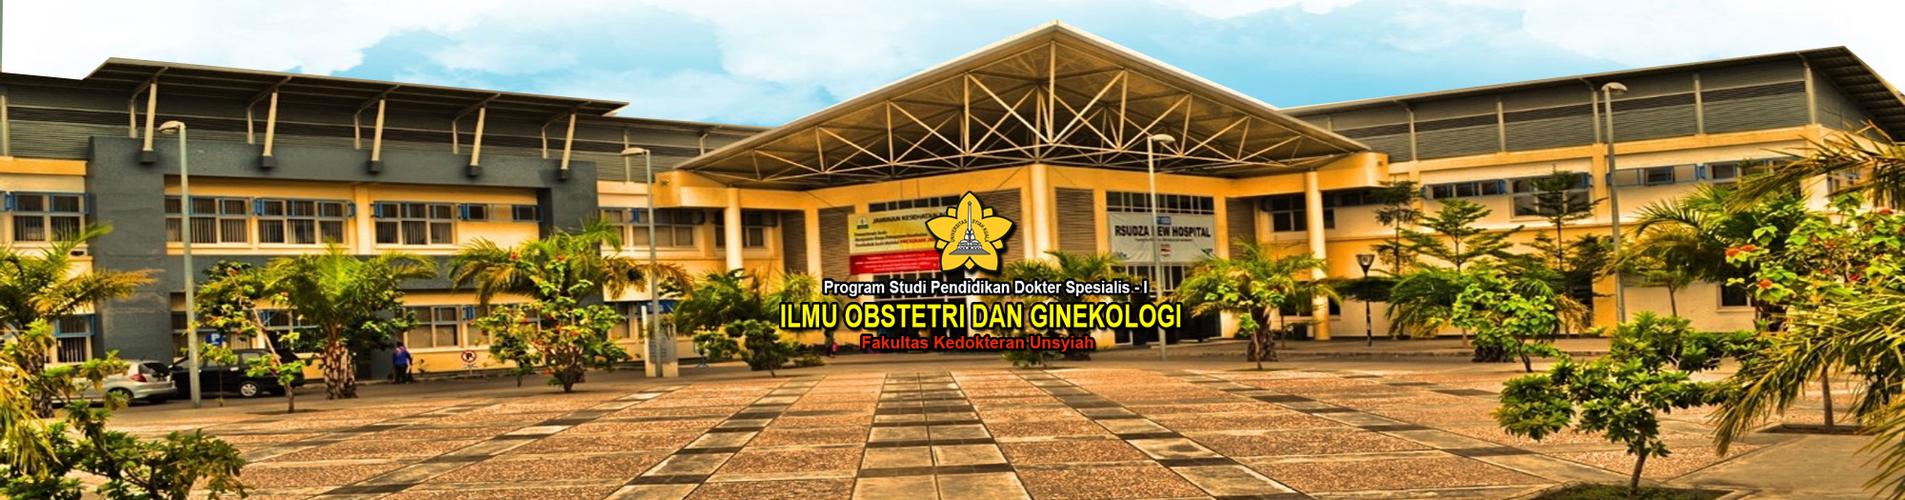 Ilmu Obstetri dan Ginekologi Unsyiah Aceh